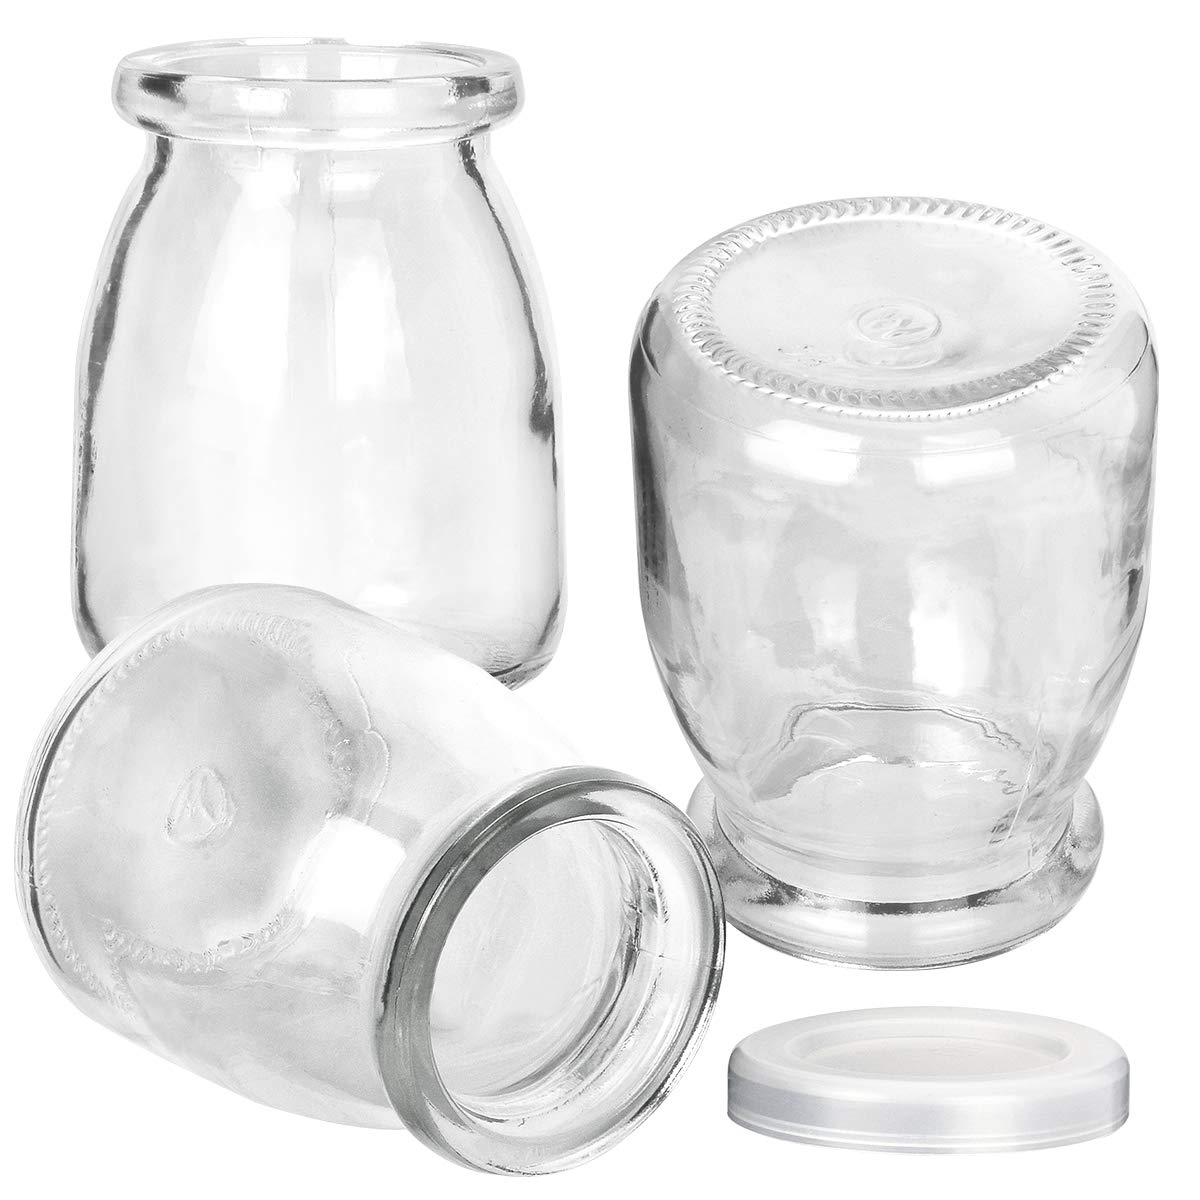 Glass Jars, KAMOTA 40 PACK 4oz Clear Yogurt Jars With PE Lids, Glass Pudding Jars Yogurt Jars Ideal for Jam, Honey, Wedding Favors, Shower Favors, Baby Foods (150ml) by KAMOTA (Image #3)